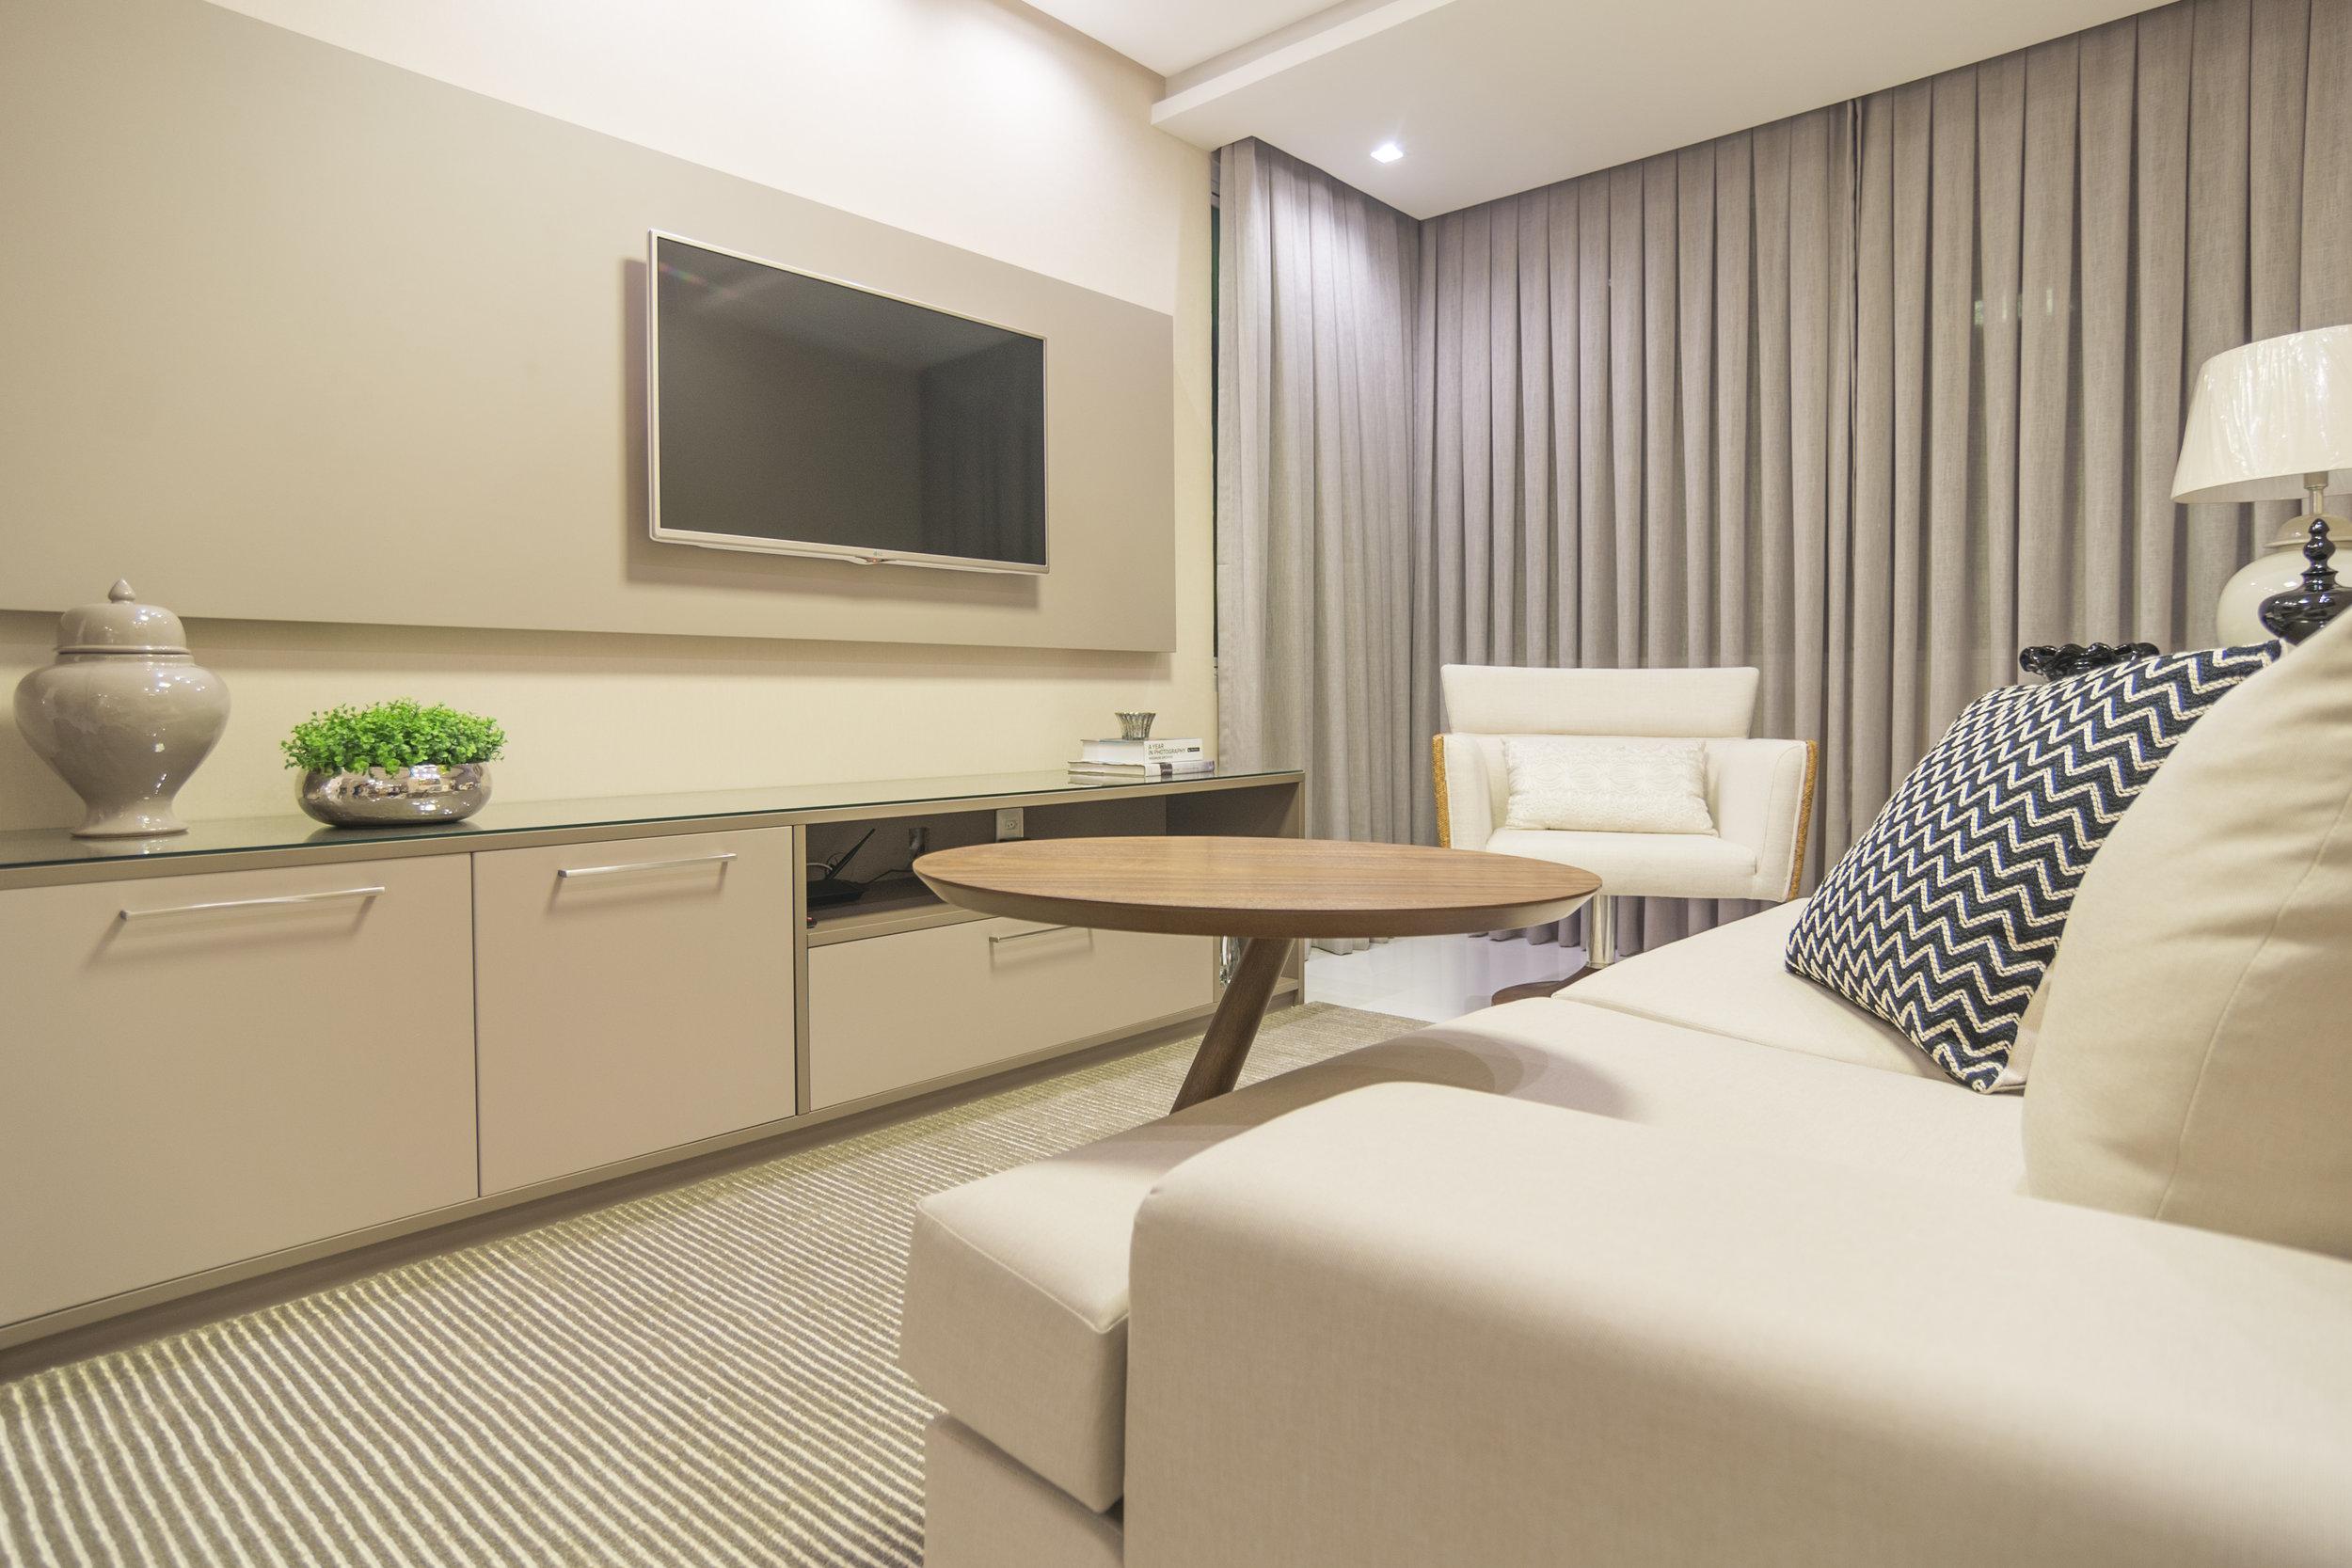 projeto-arquitetonico-robertoindira-duo-arquitetura-apartamentos-estar-06.jpg